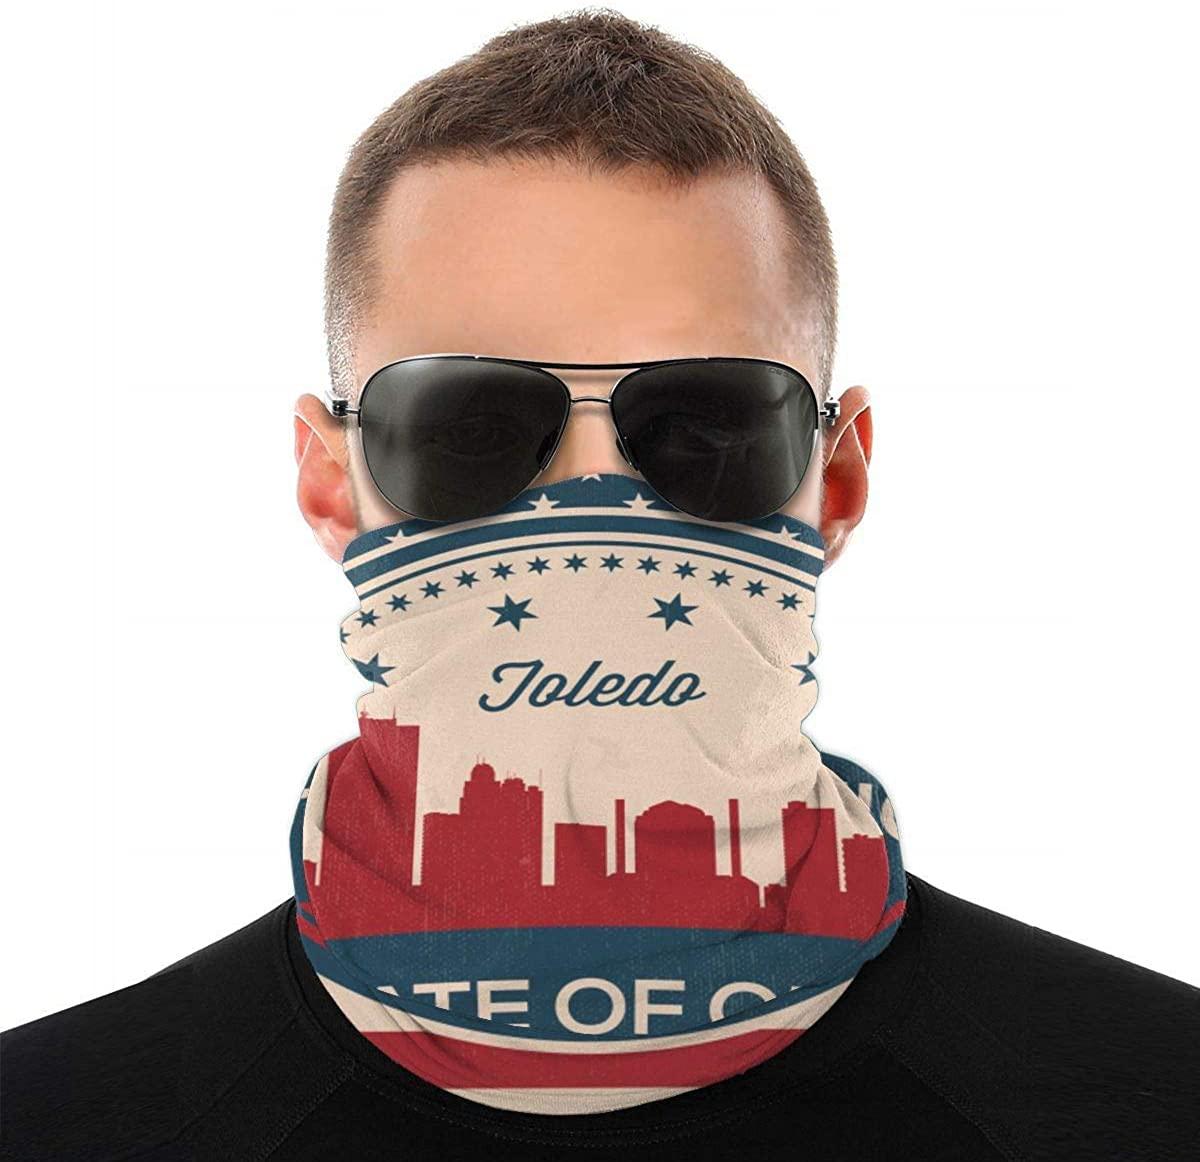 Ohio State Toledo Skyline Bandanas Magic Headband Face Mask For Dust, Outdoors, Festivals, Sports